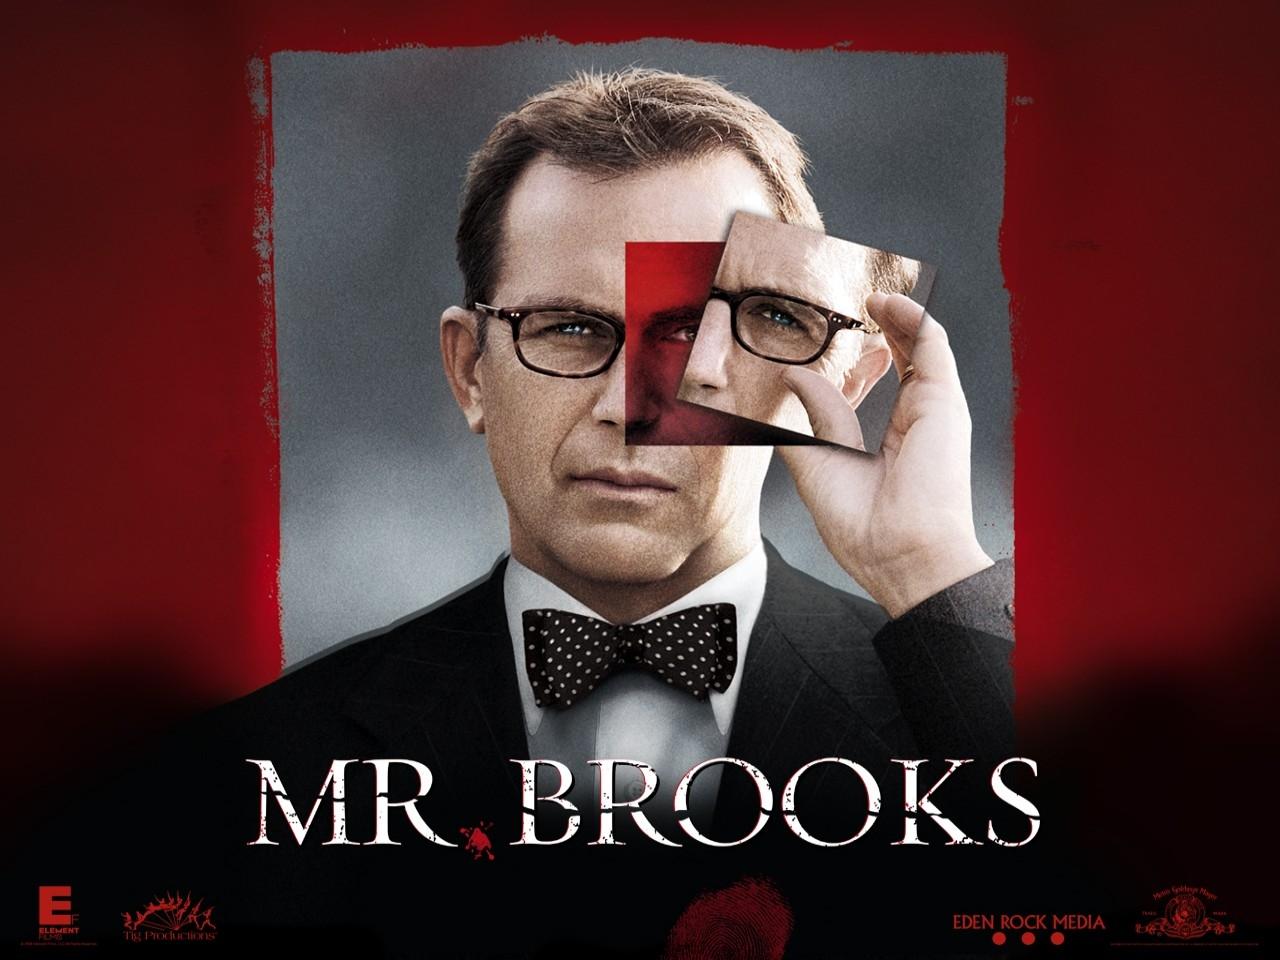 Wallpaper del film Mr. Brooks